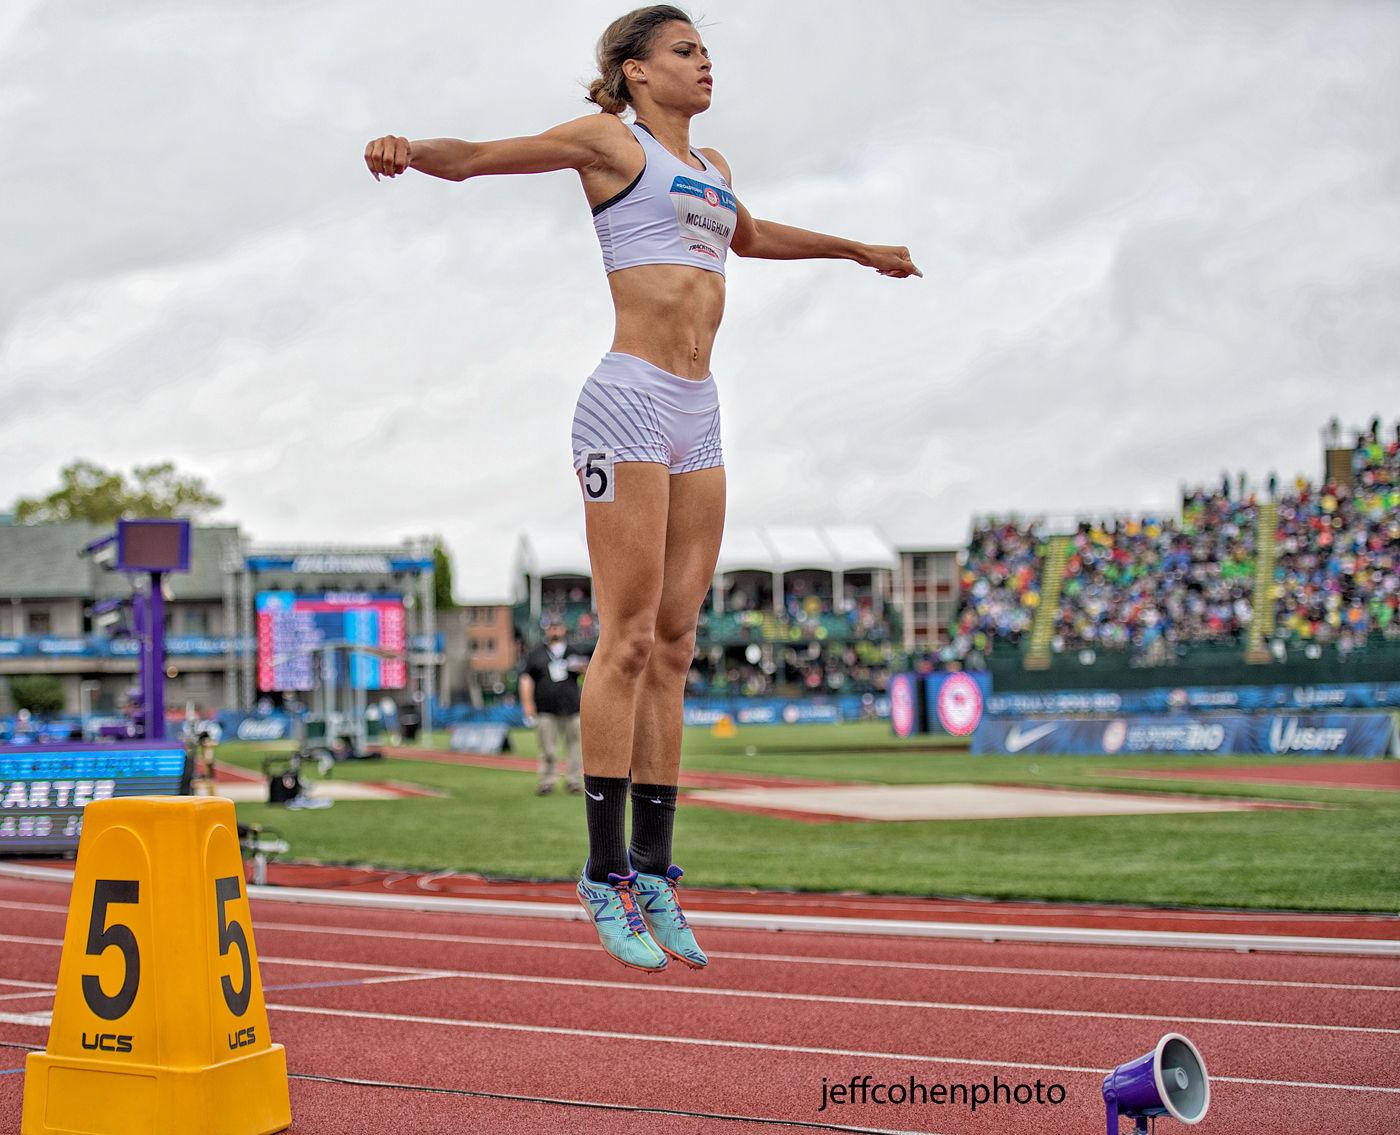 1r2016_oly_trials_day_9_sydney_mclaughlin_400hw_jump_jeff_cohen_photo_28066_web.jpg